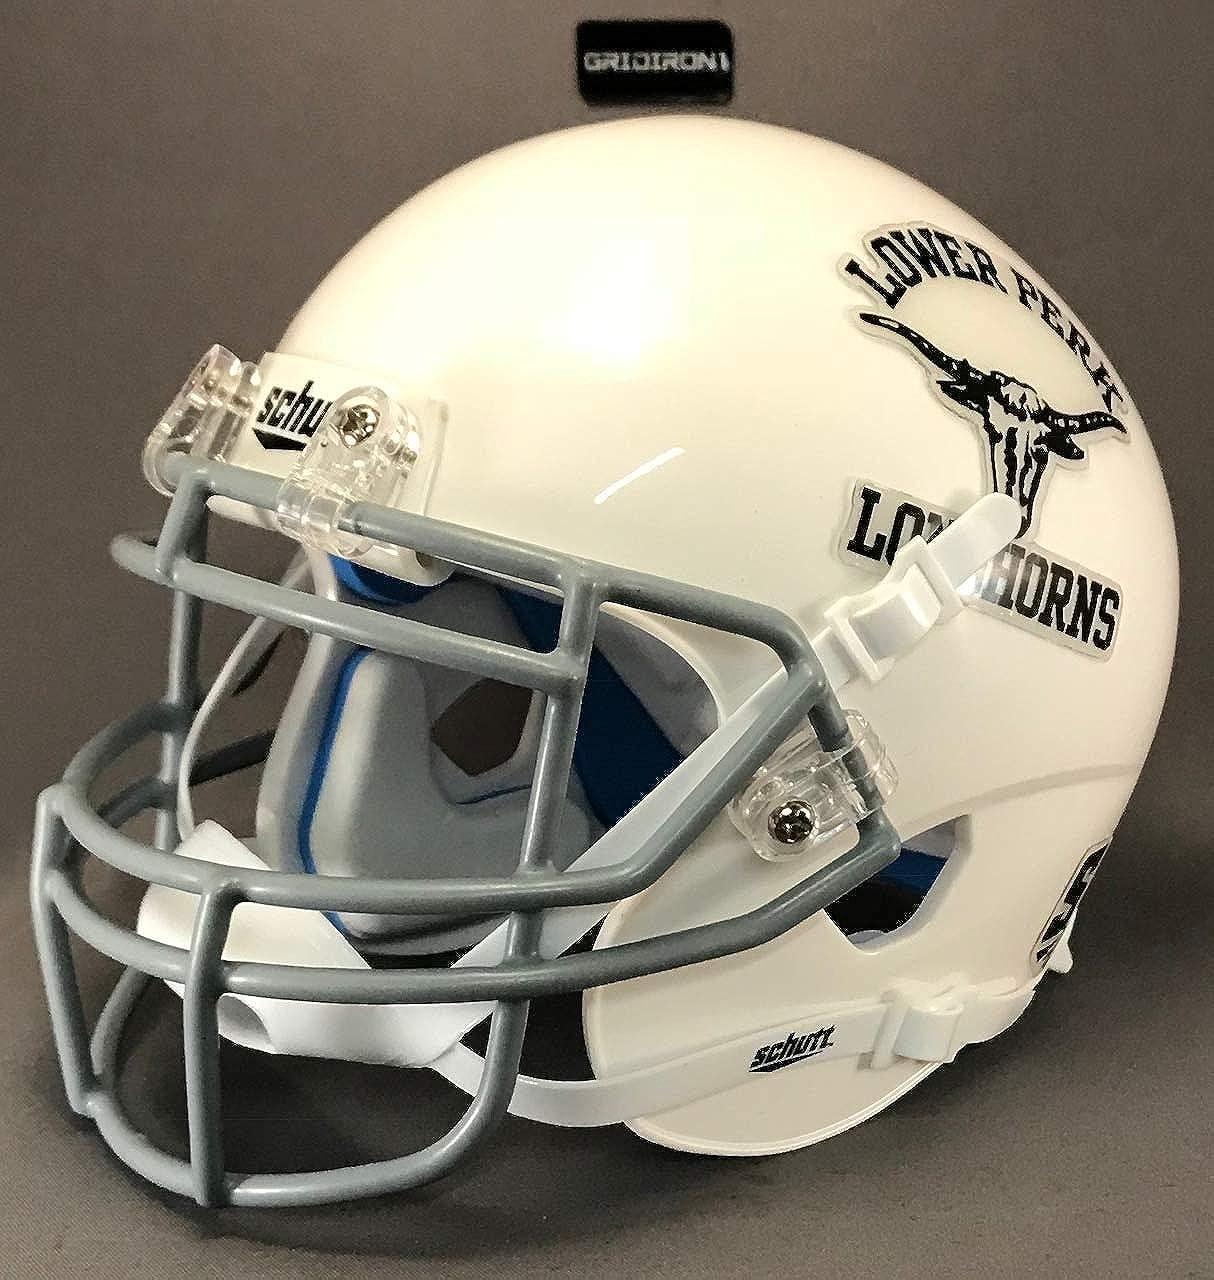 Lower Perk Longhorns 1963 Rapid rise - High Mi Football Long-awaited School Pennsylvania